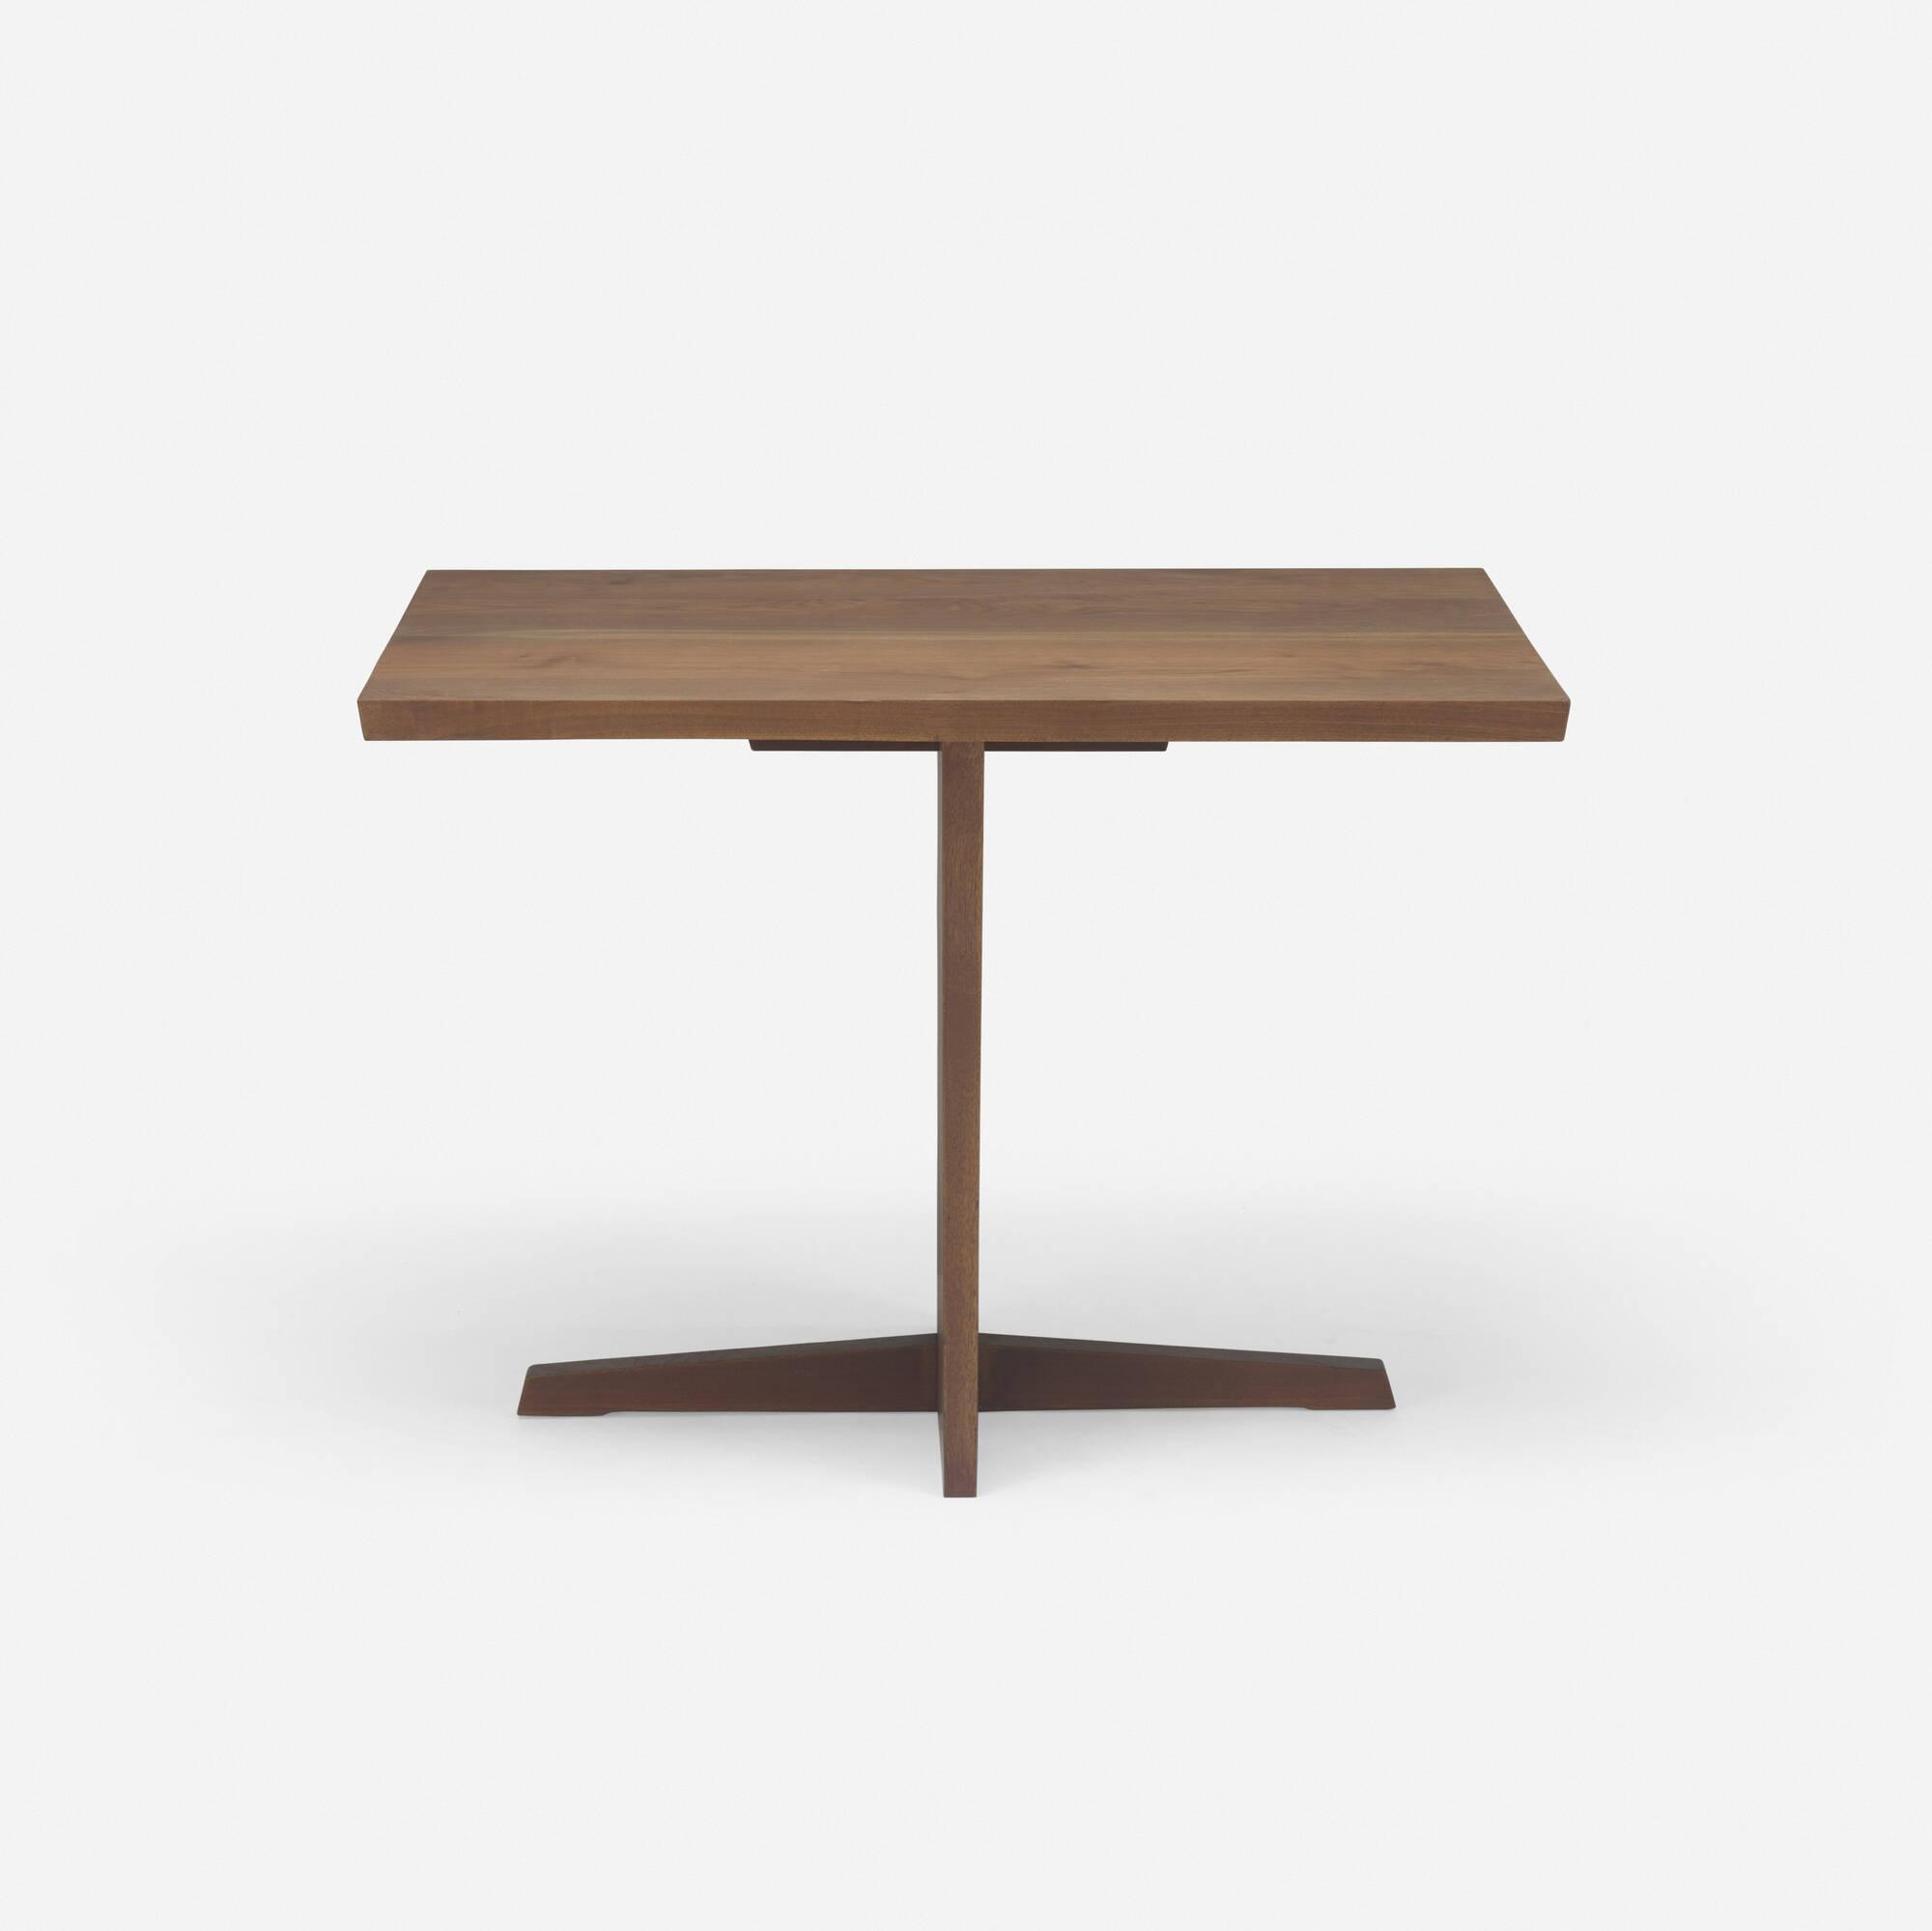 143 george nakashima minguren i table for Email table design